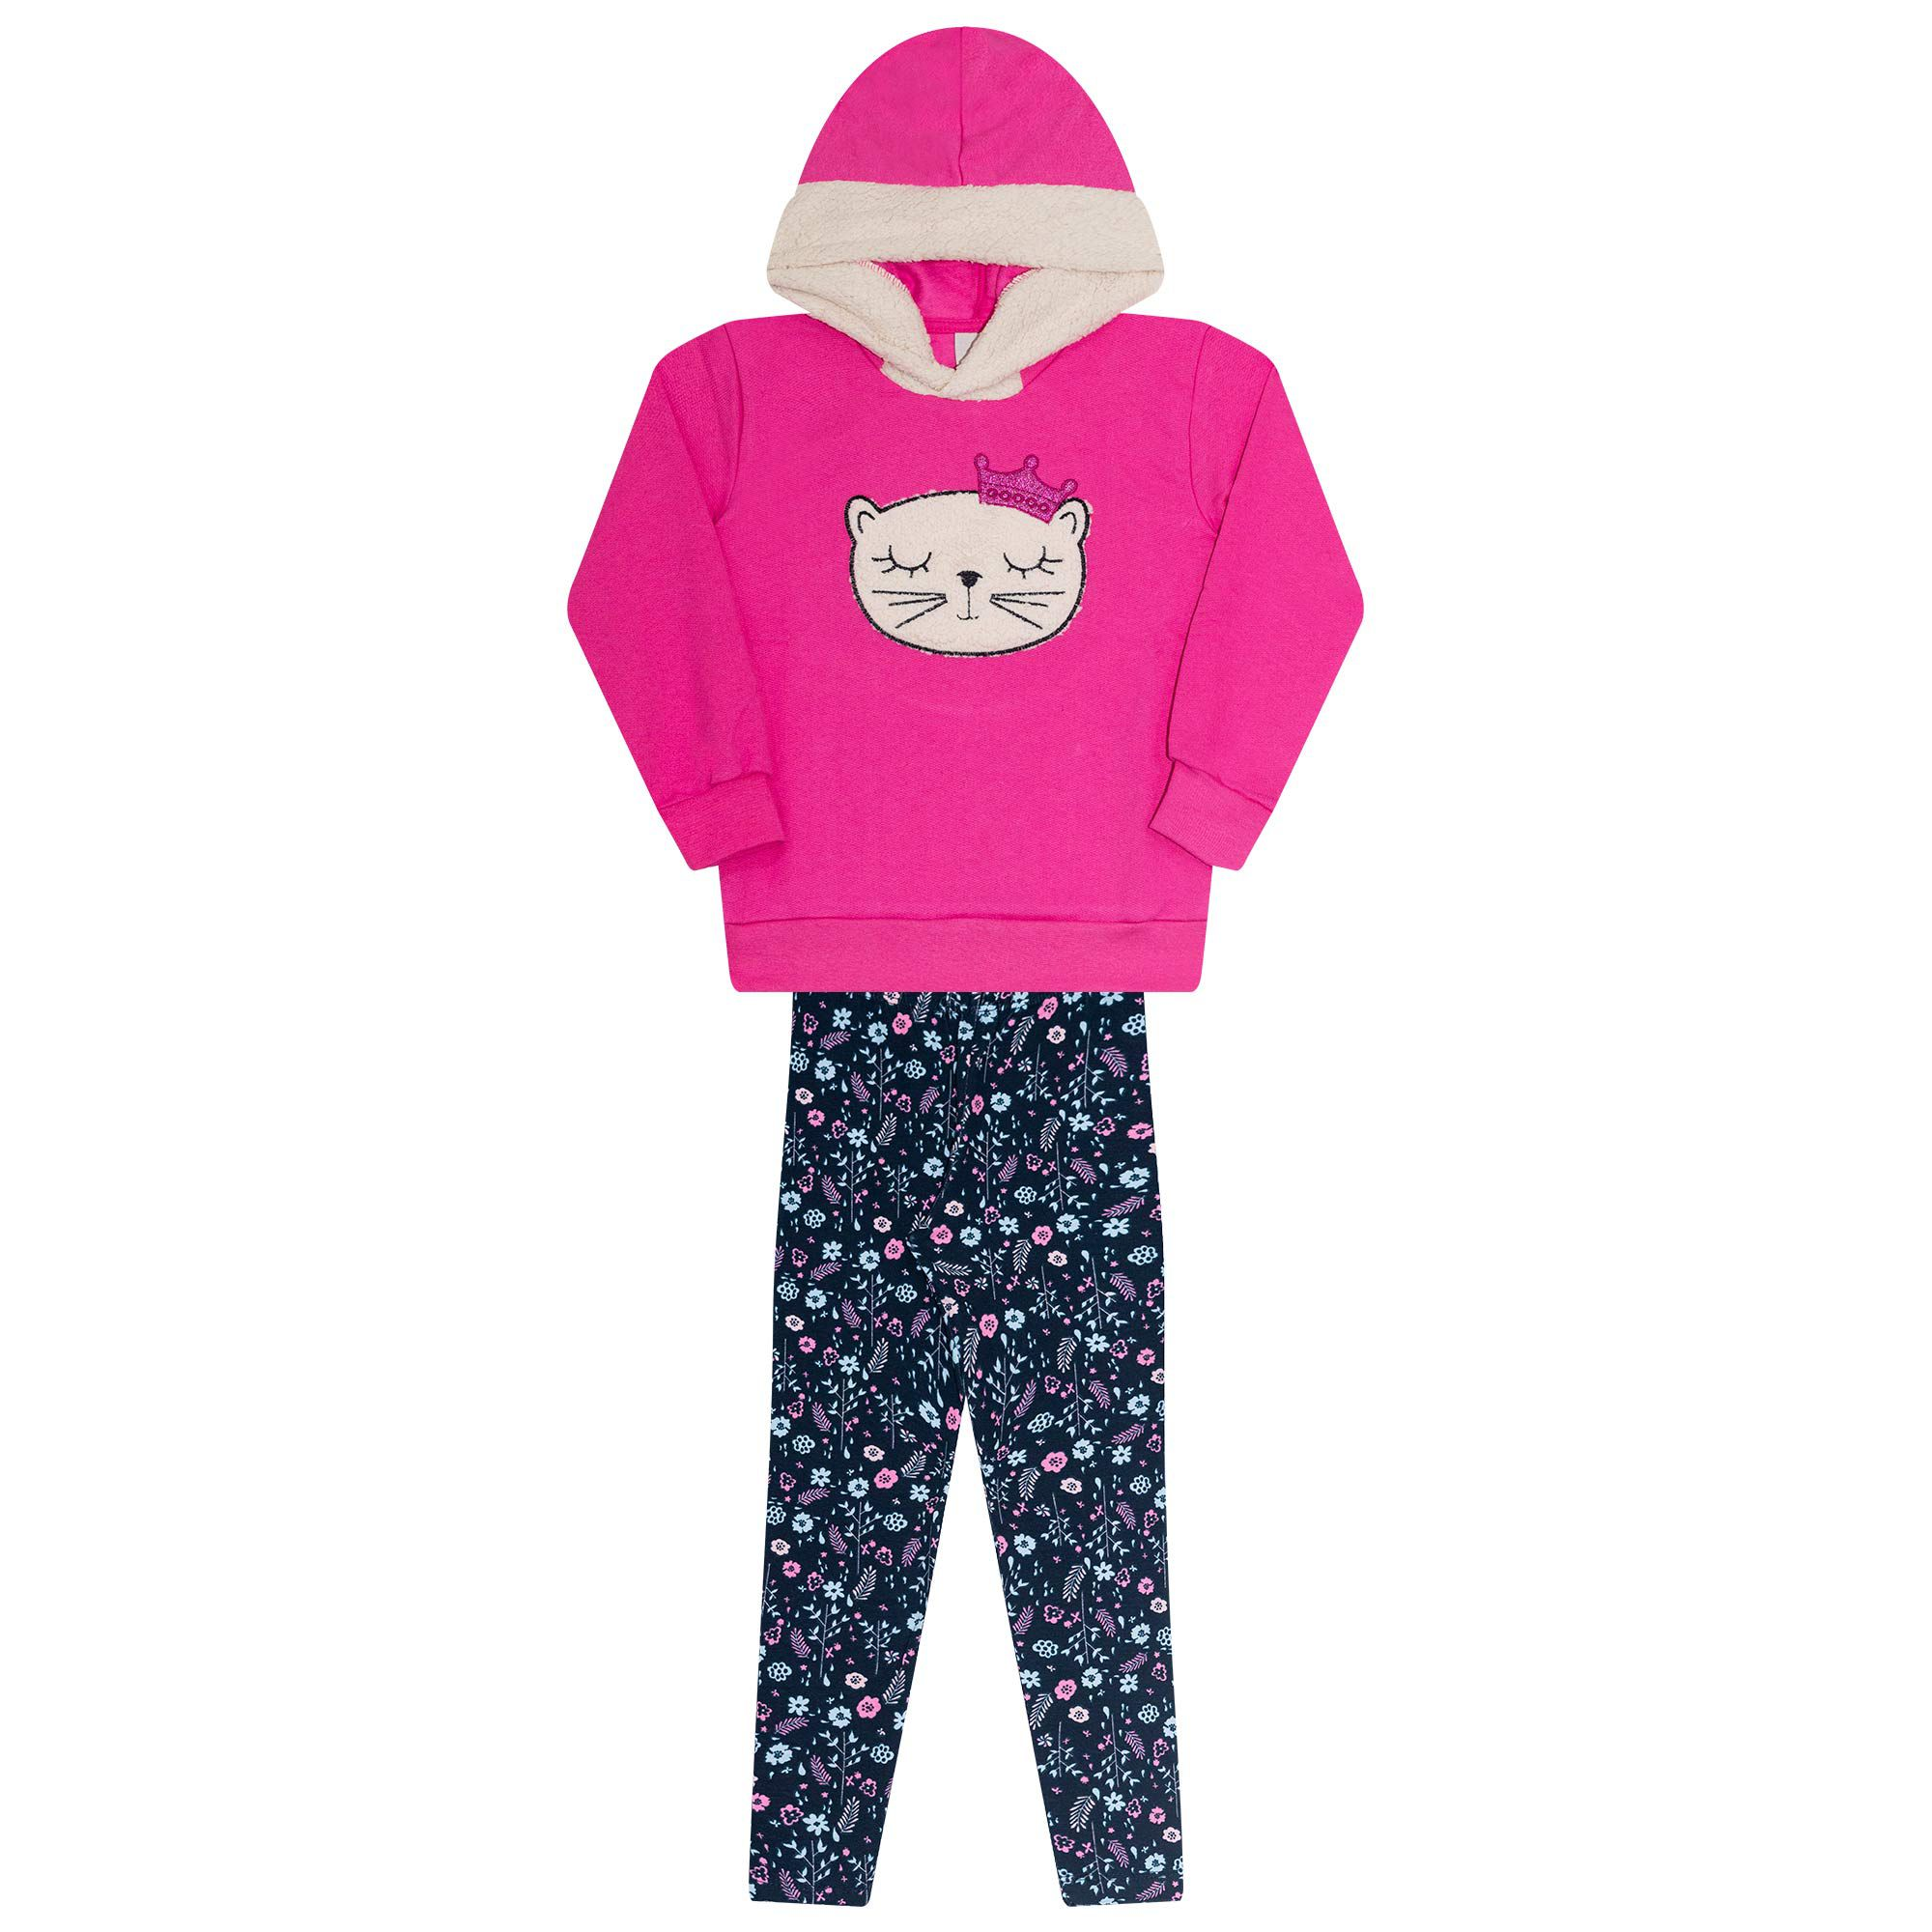 Conjunto Infantil Feminino  2 peças - Ref 30204 - Pink Alécia - Ralakids